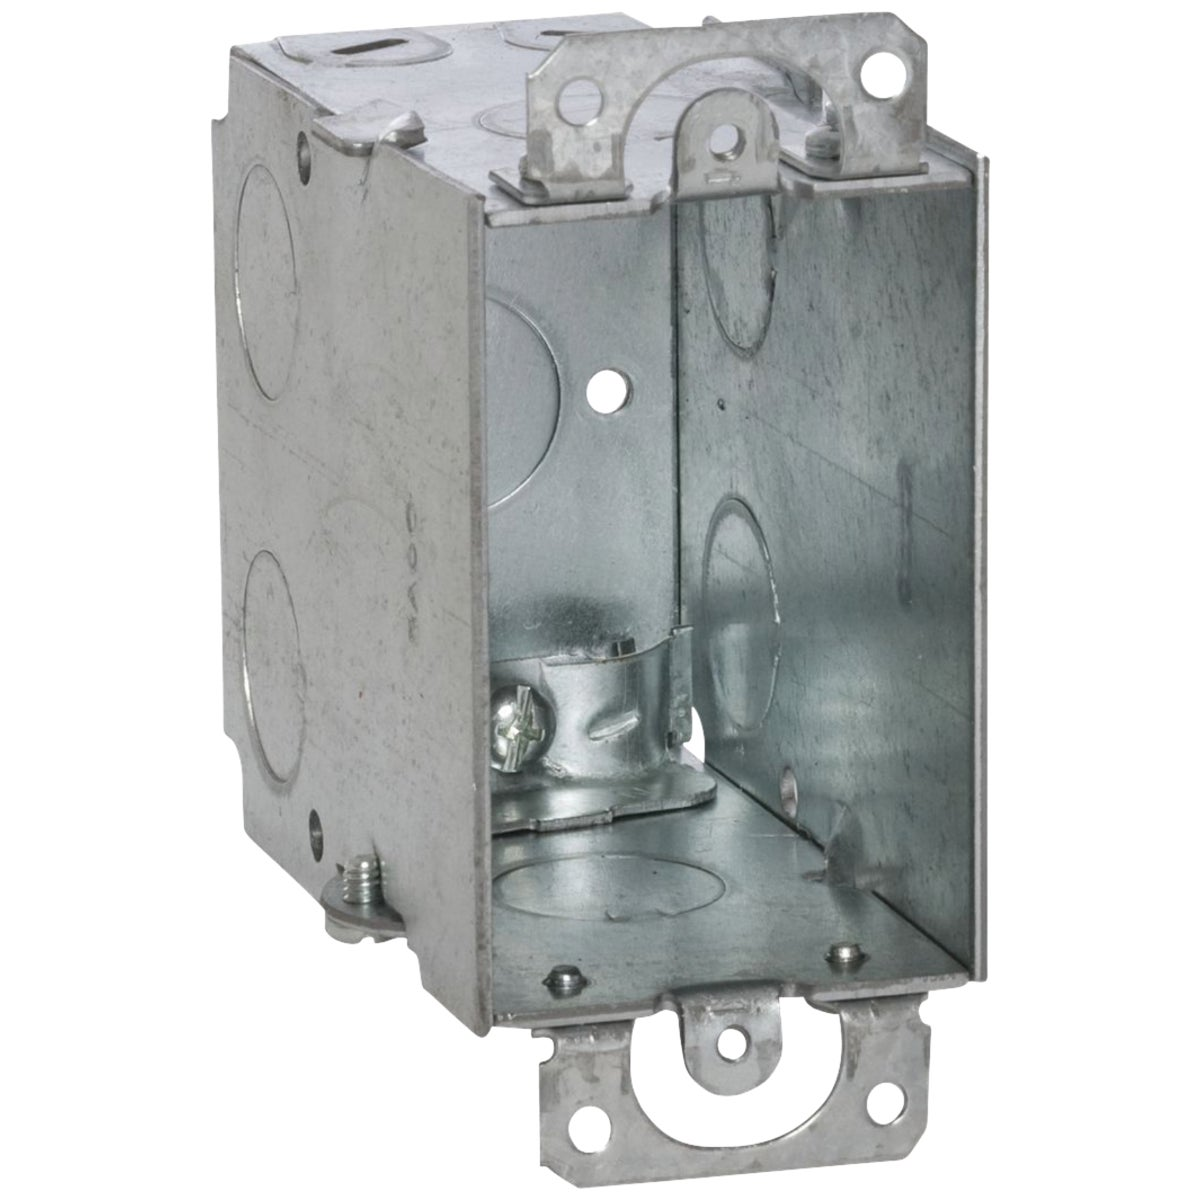 3X2X3-1/2 GANGABLE BOX - CXWOW by Thomas & Betts